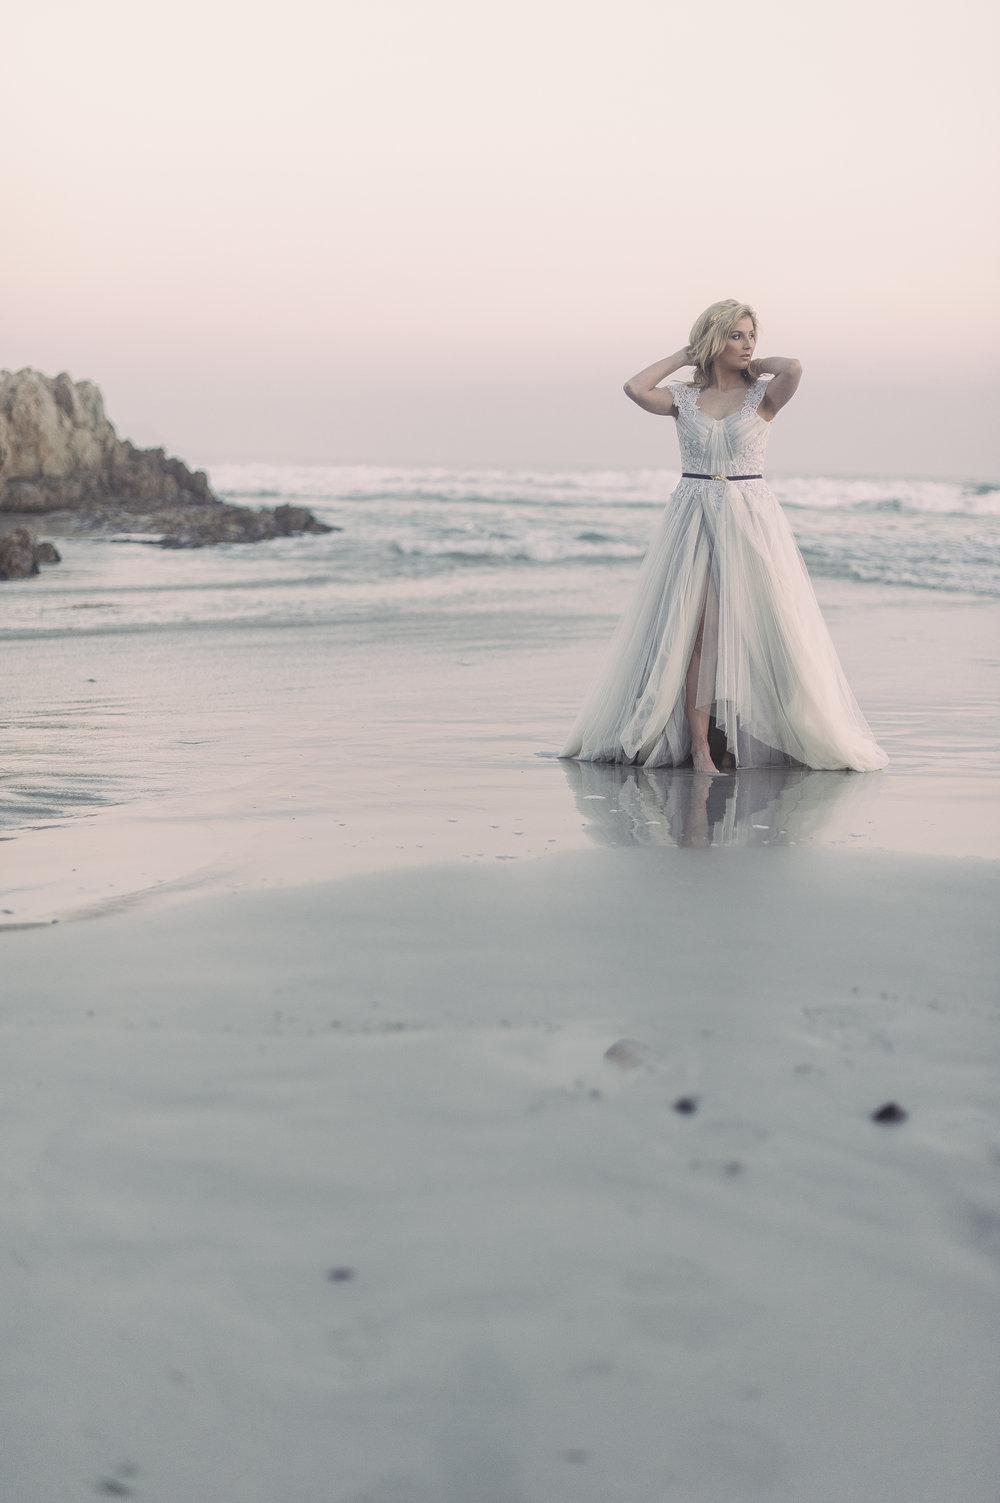 RyanParker_Wedding_Photographer_CapeTown_Hermanus_StyledShoot_DSC_6163.jpg